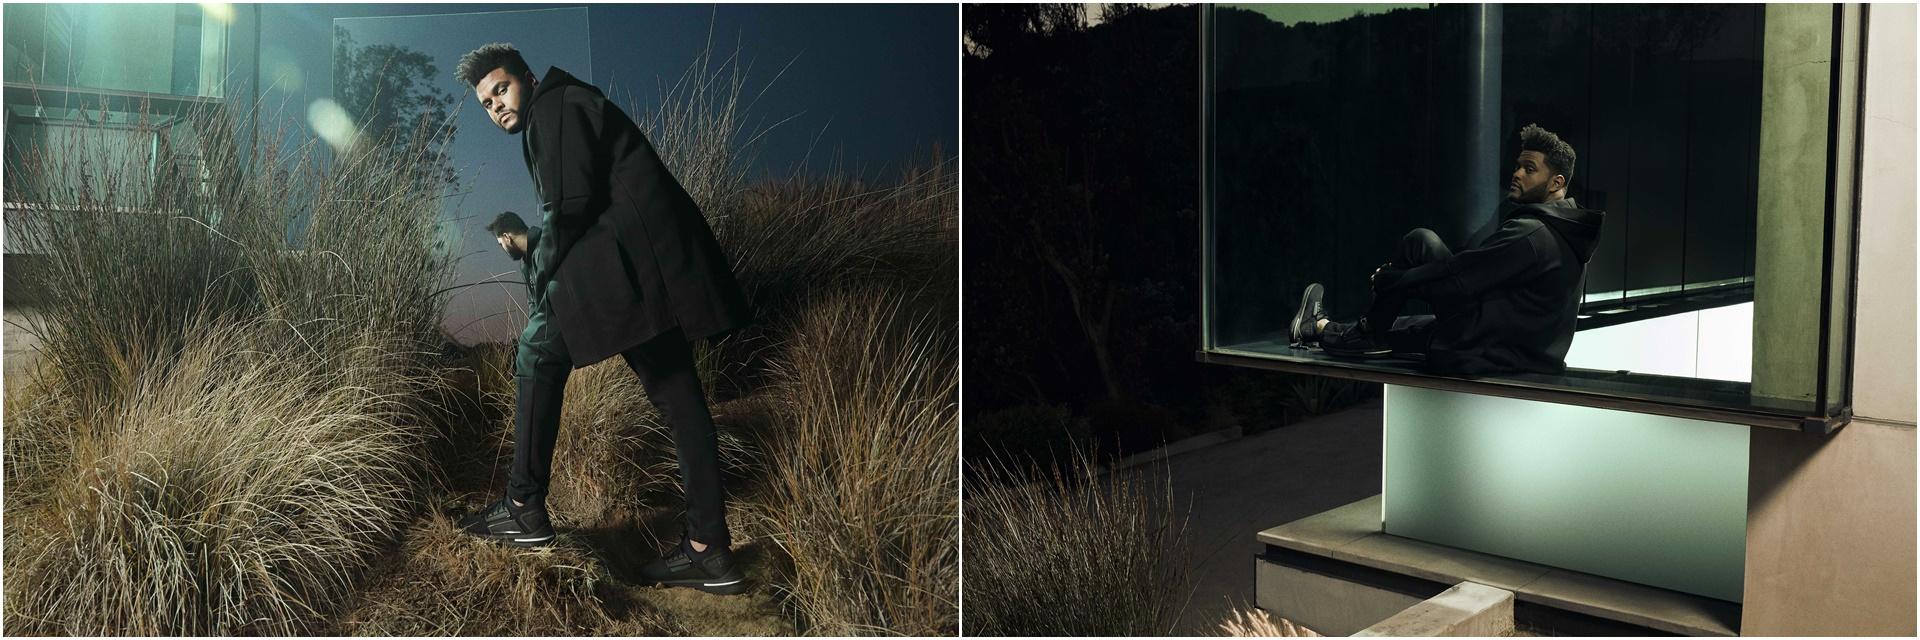 IG 怎麼刷都漆黑一片!?原來是 PUMA IGNITE Limitless SR 掀起的「暗黑潮尚」瘋狂洗版,看東西方男神楊洋、威肯怎麼穿!